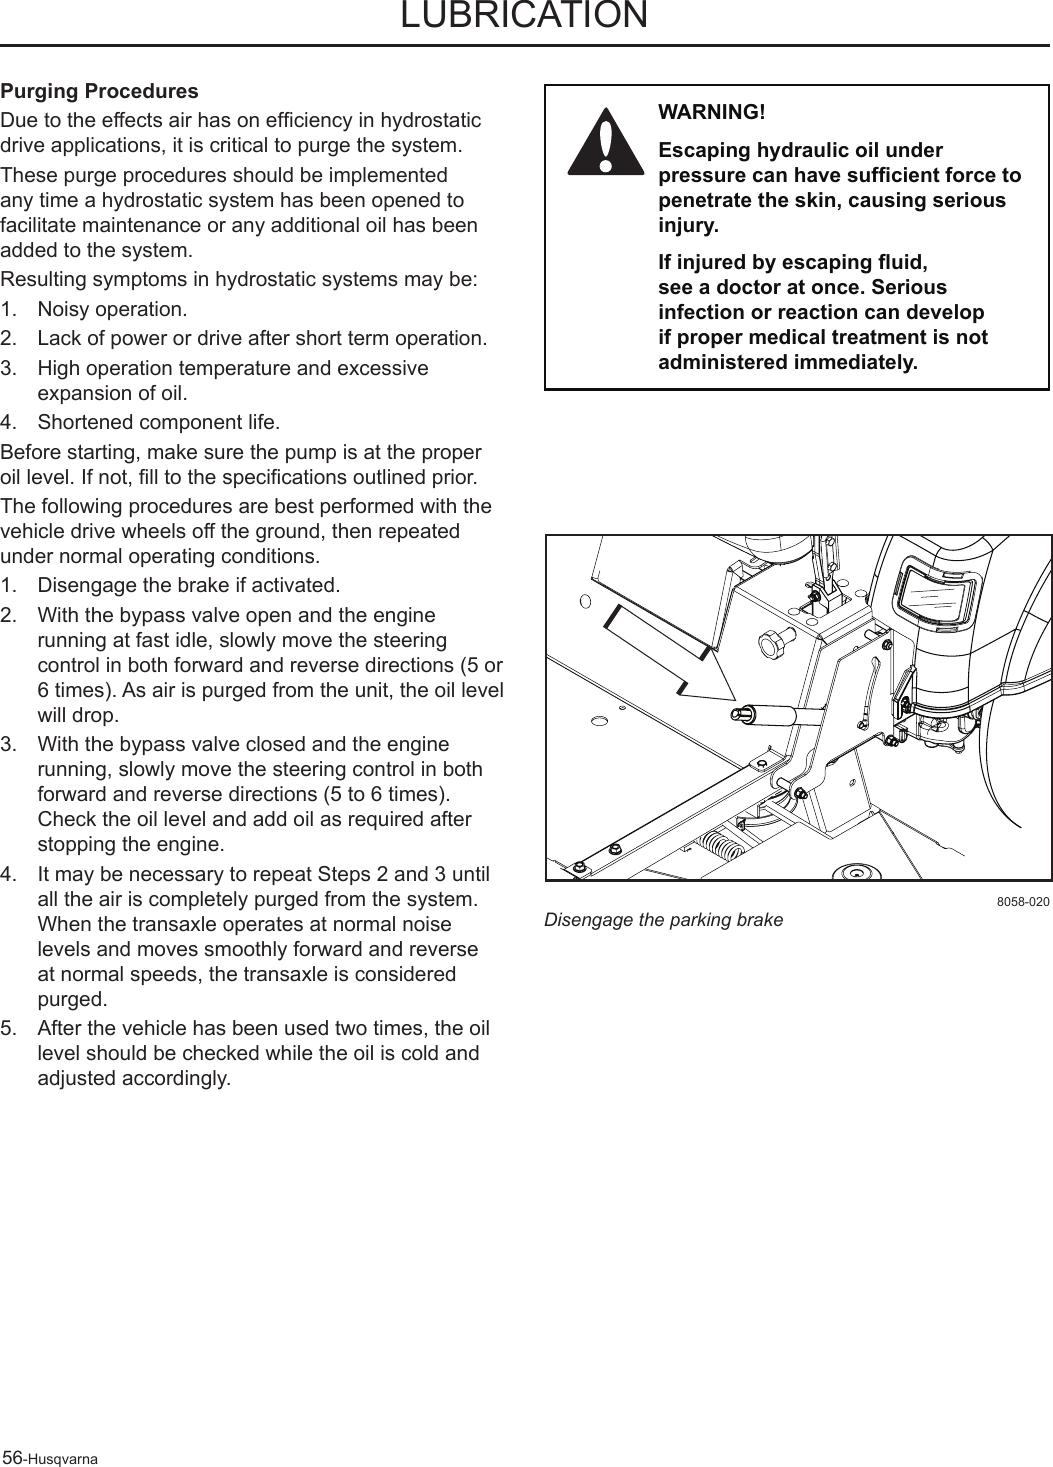 Husqvarna Lawn Mower Ez4824 965880401 Users Manual OM, EZ ZERO TURN